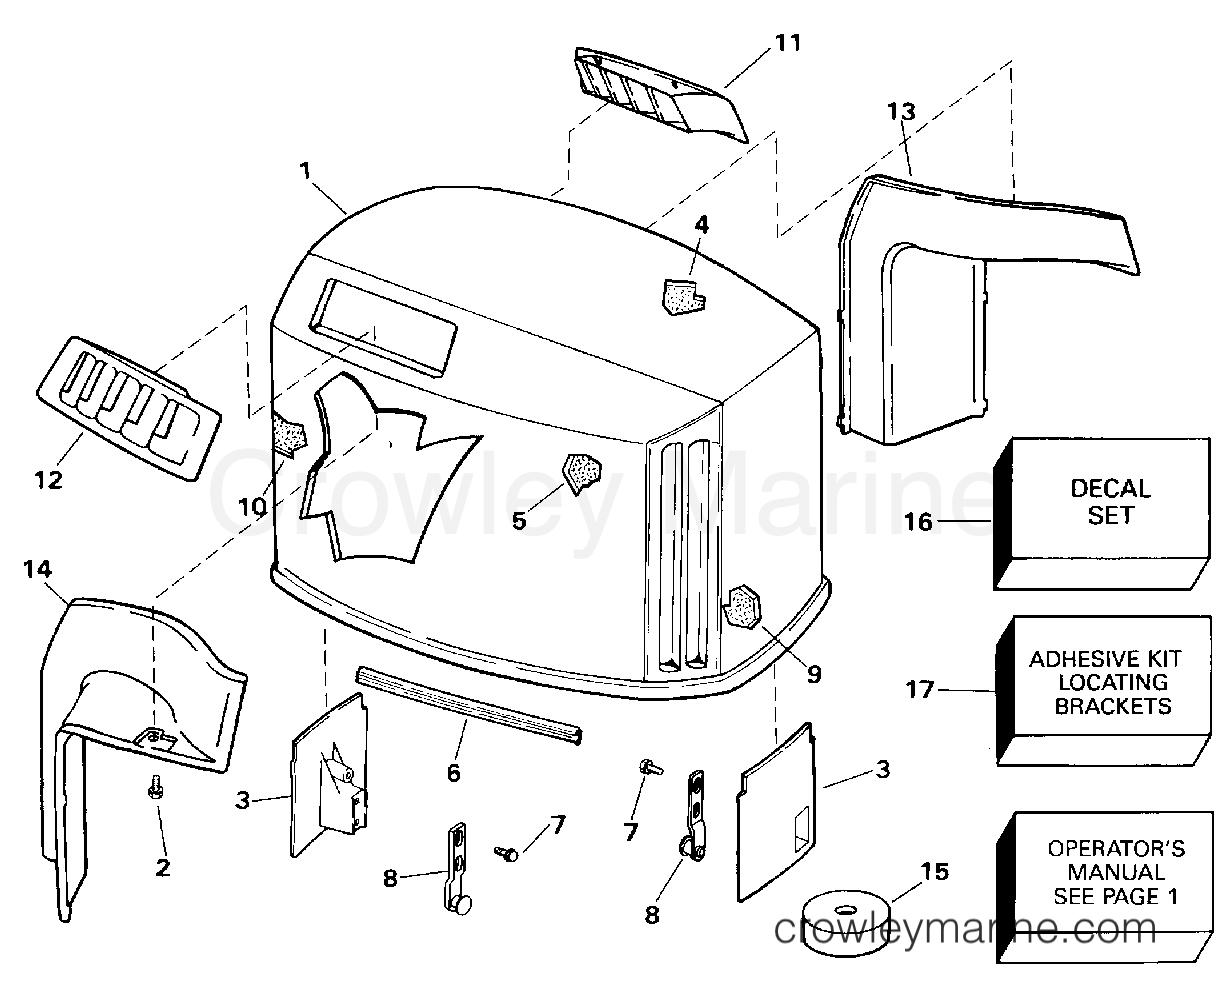 1994 Evinrude Outboards 150 - E150WTLERC ENGINE COVER - EVINRUDE section